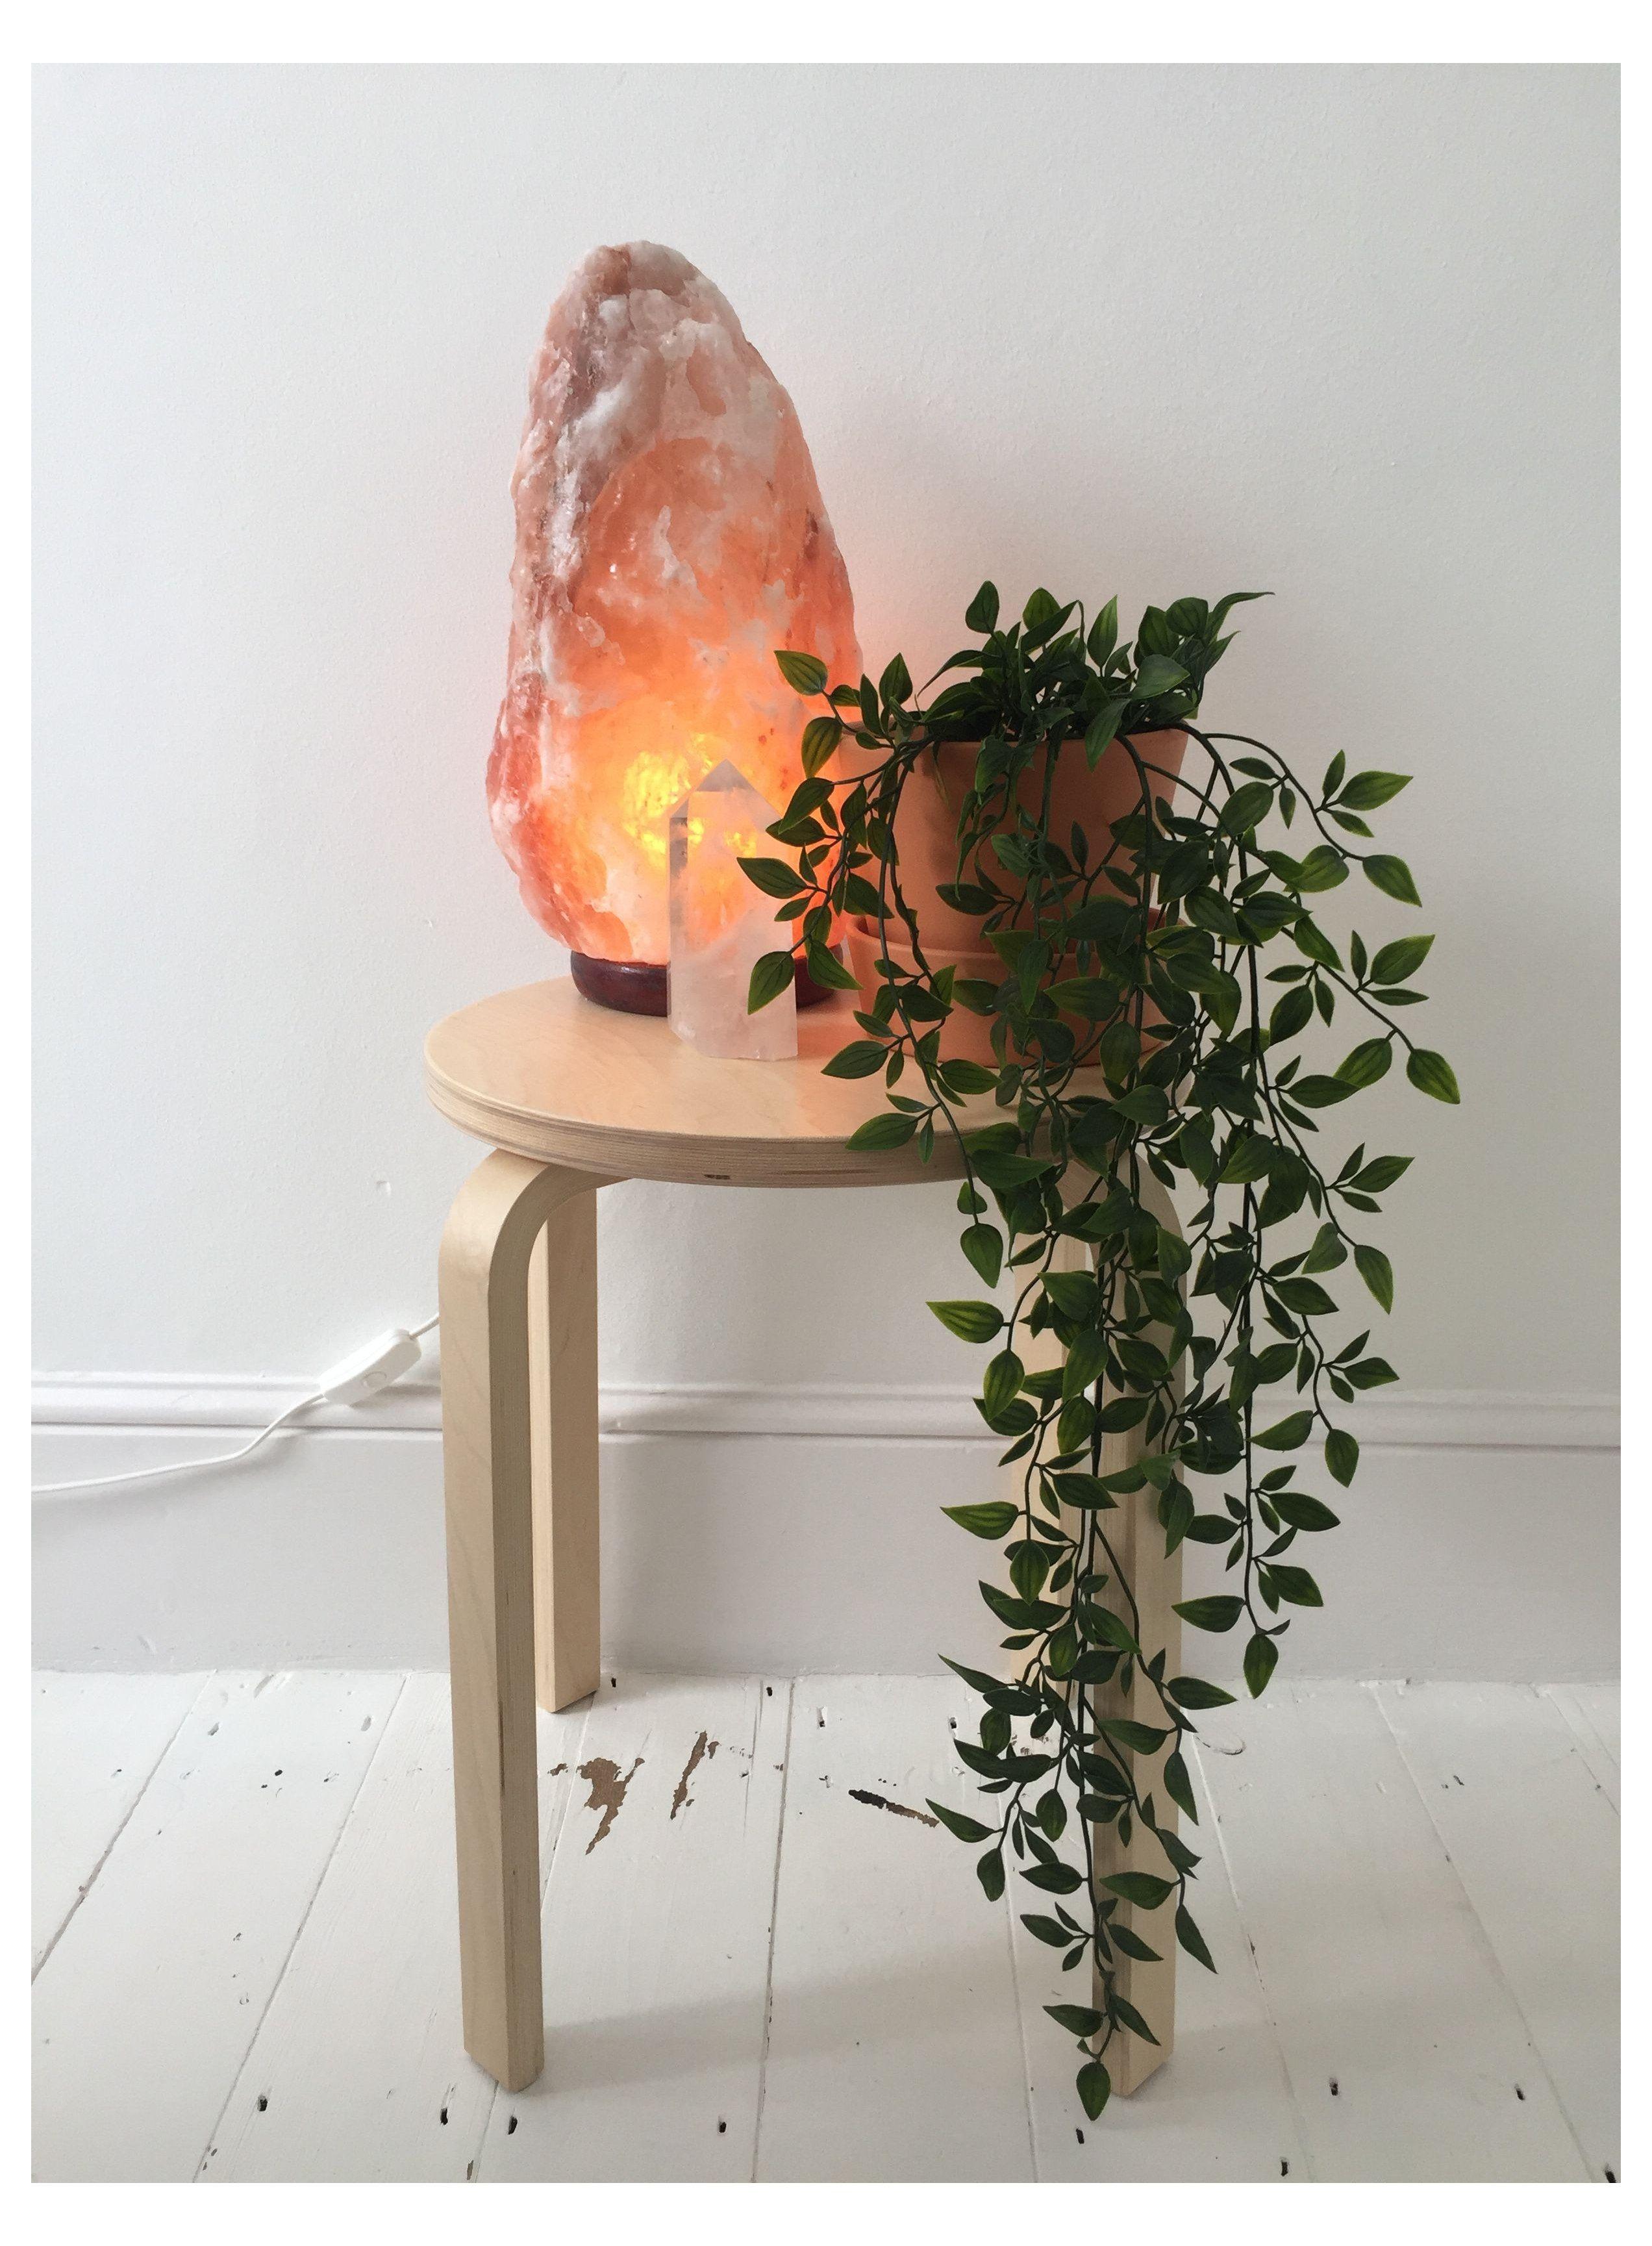 salt lamp and plants